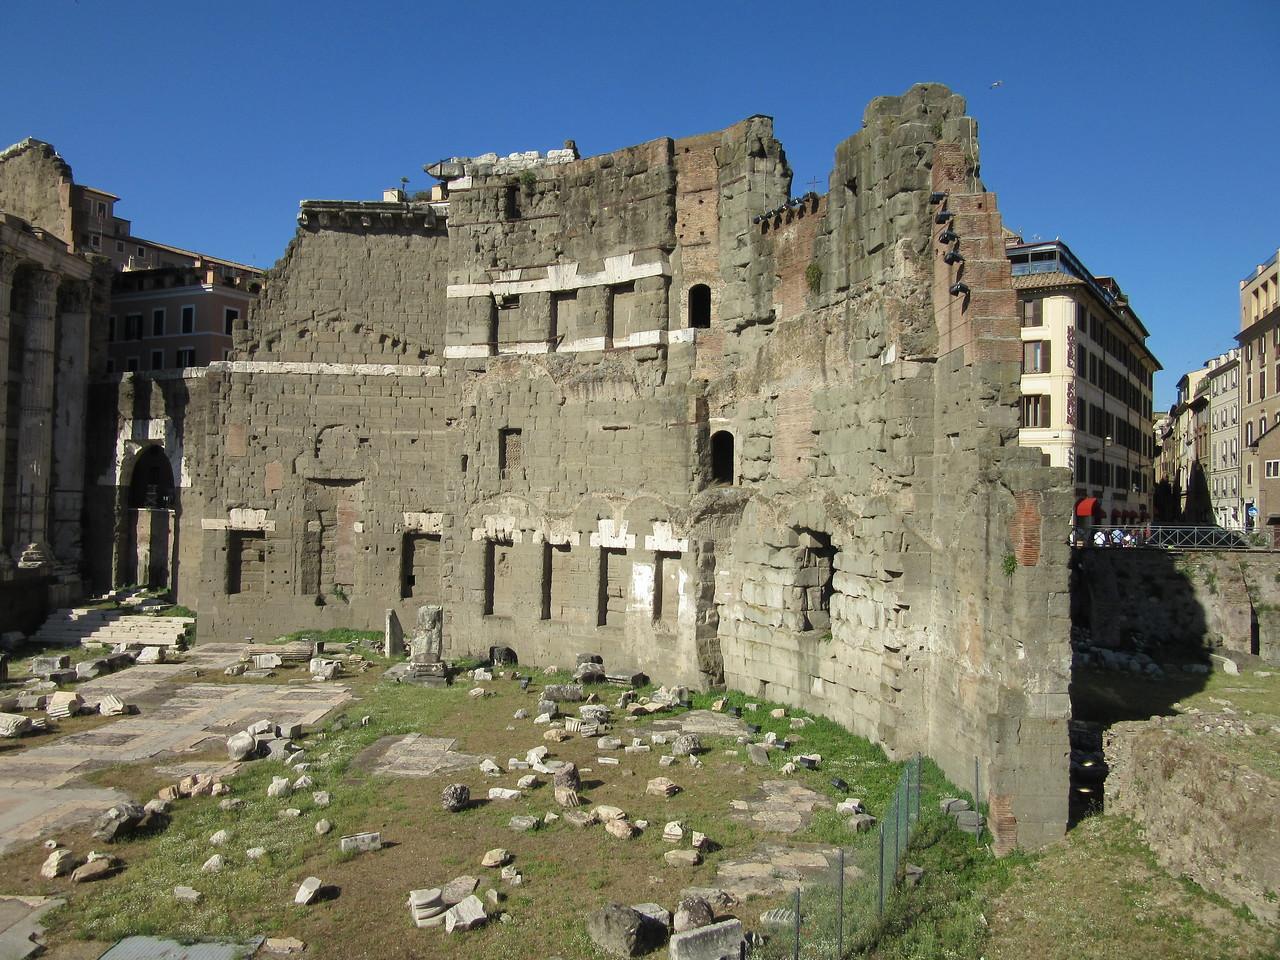 Ruins near our hotel.